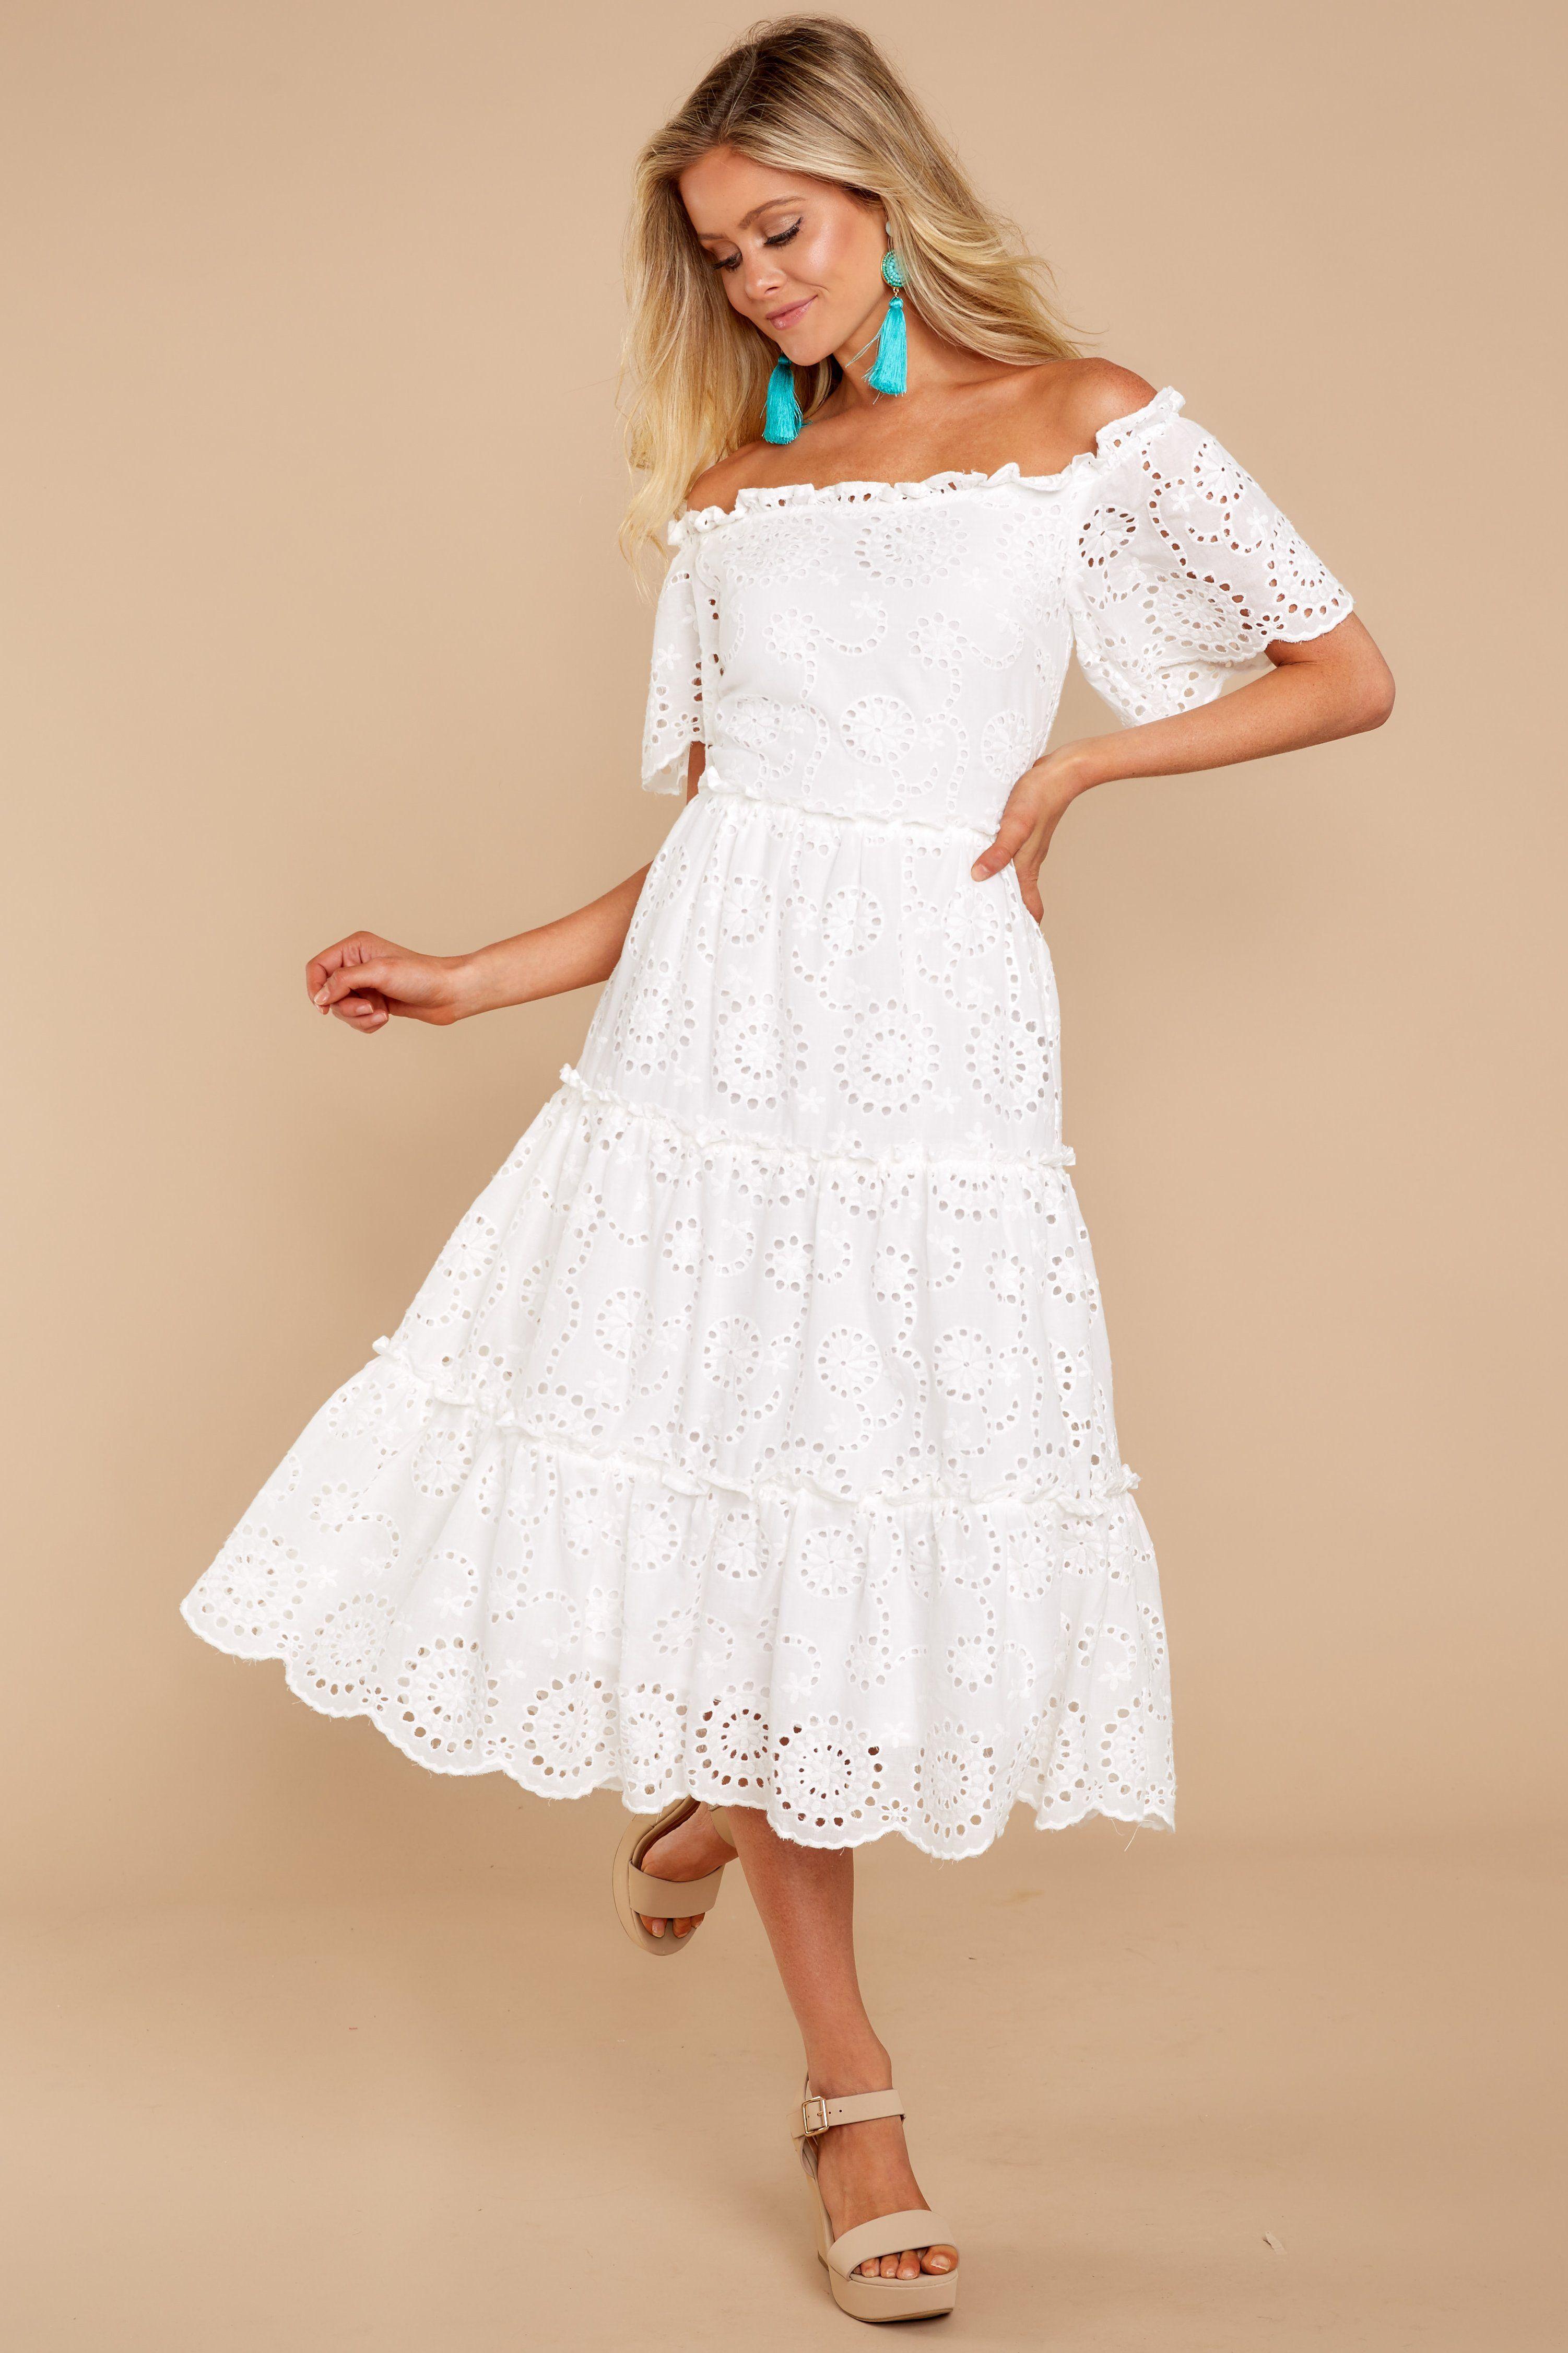 9f70fba91a8f Chic White Eyelet Dress - Trendy Eyelet Dress - Dress - $64.00 – Red Dress  Boutique